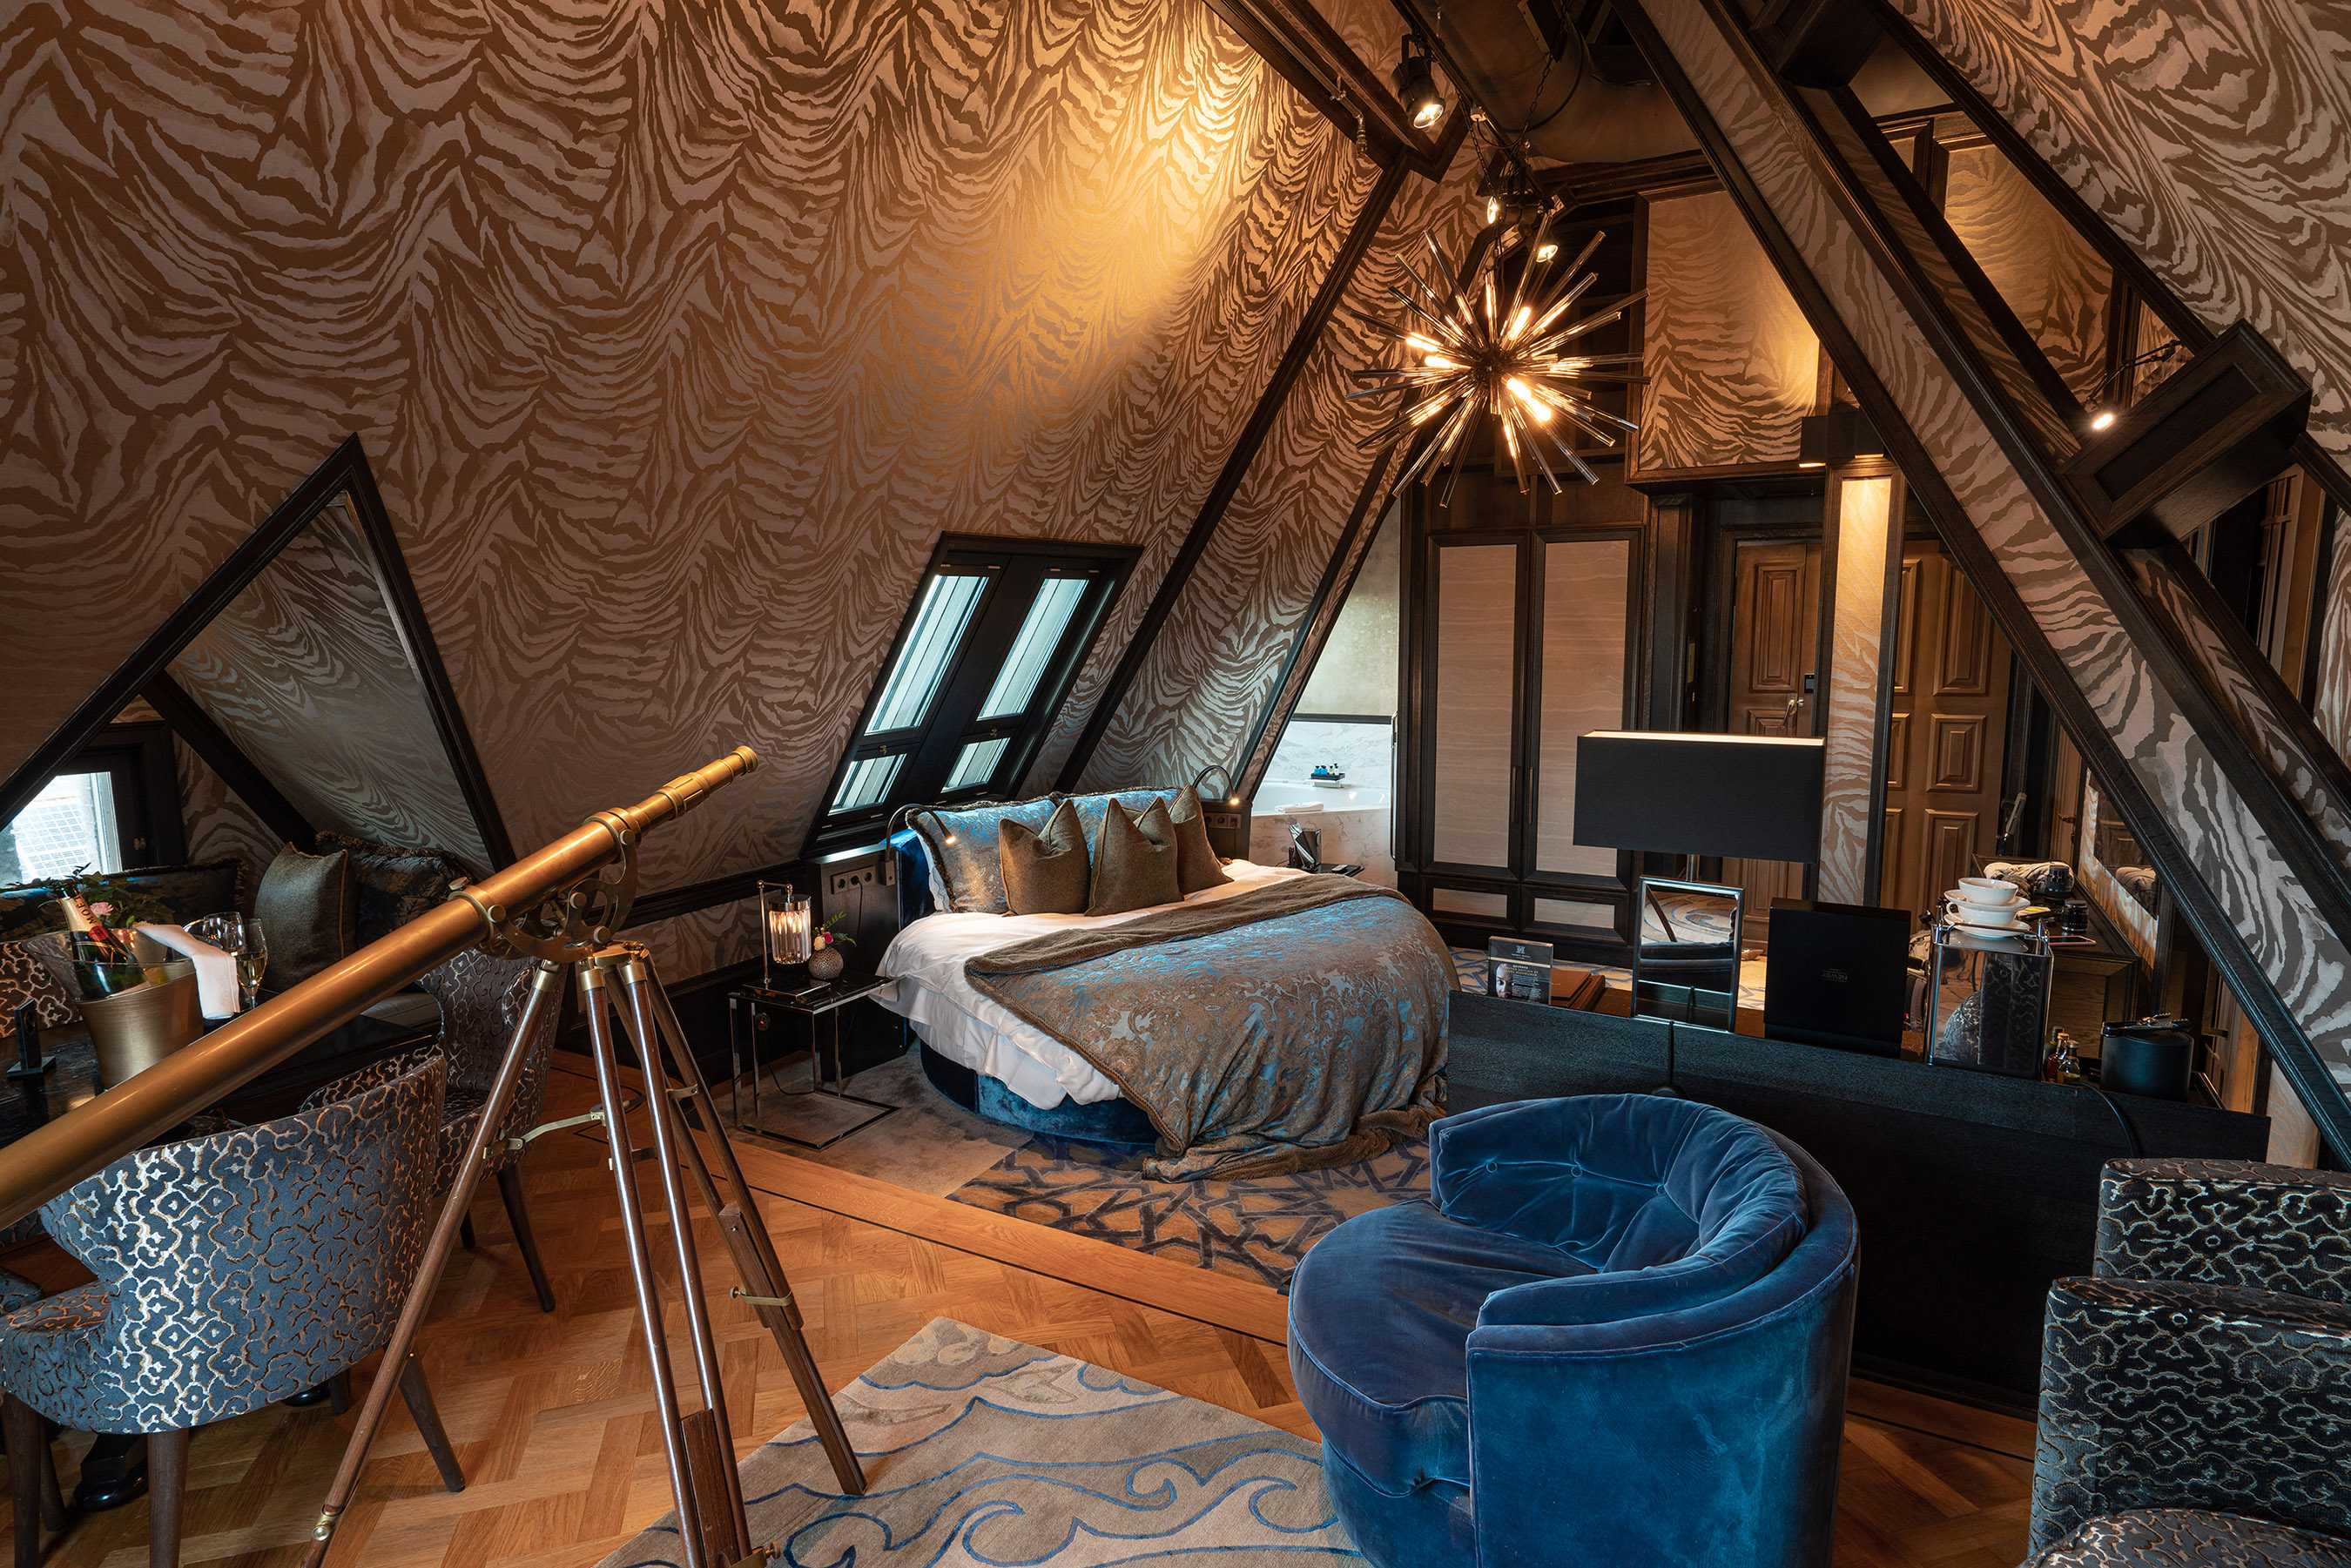 Twentyseven hotel Amsterdam rooftop stage suite 2